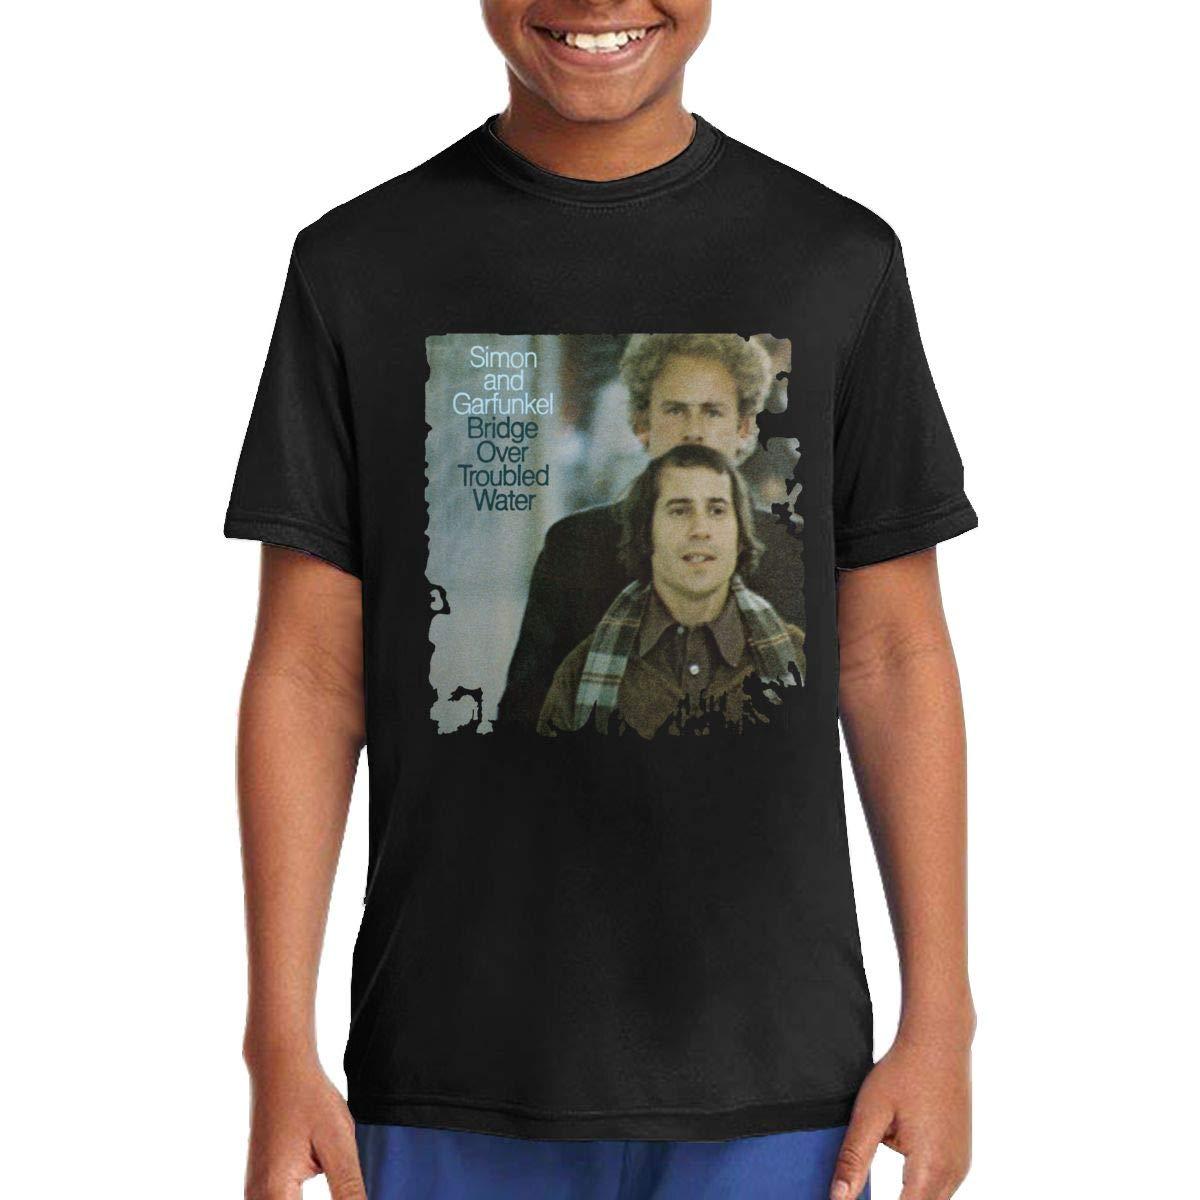 Donalddedwards Girls Simon Garfunkel T Shirt Unisex Juvenile Tshirts Black